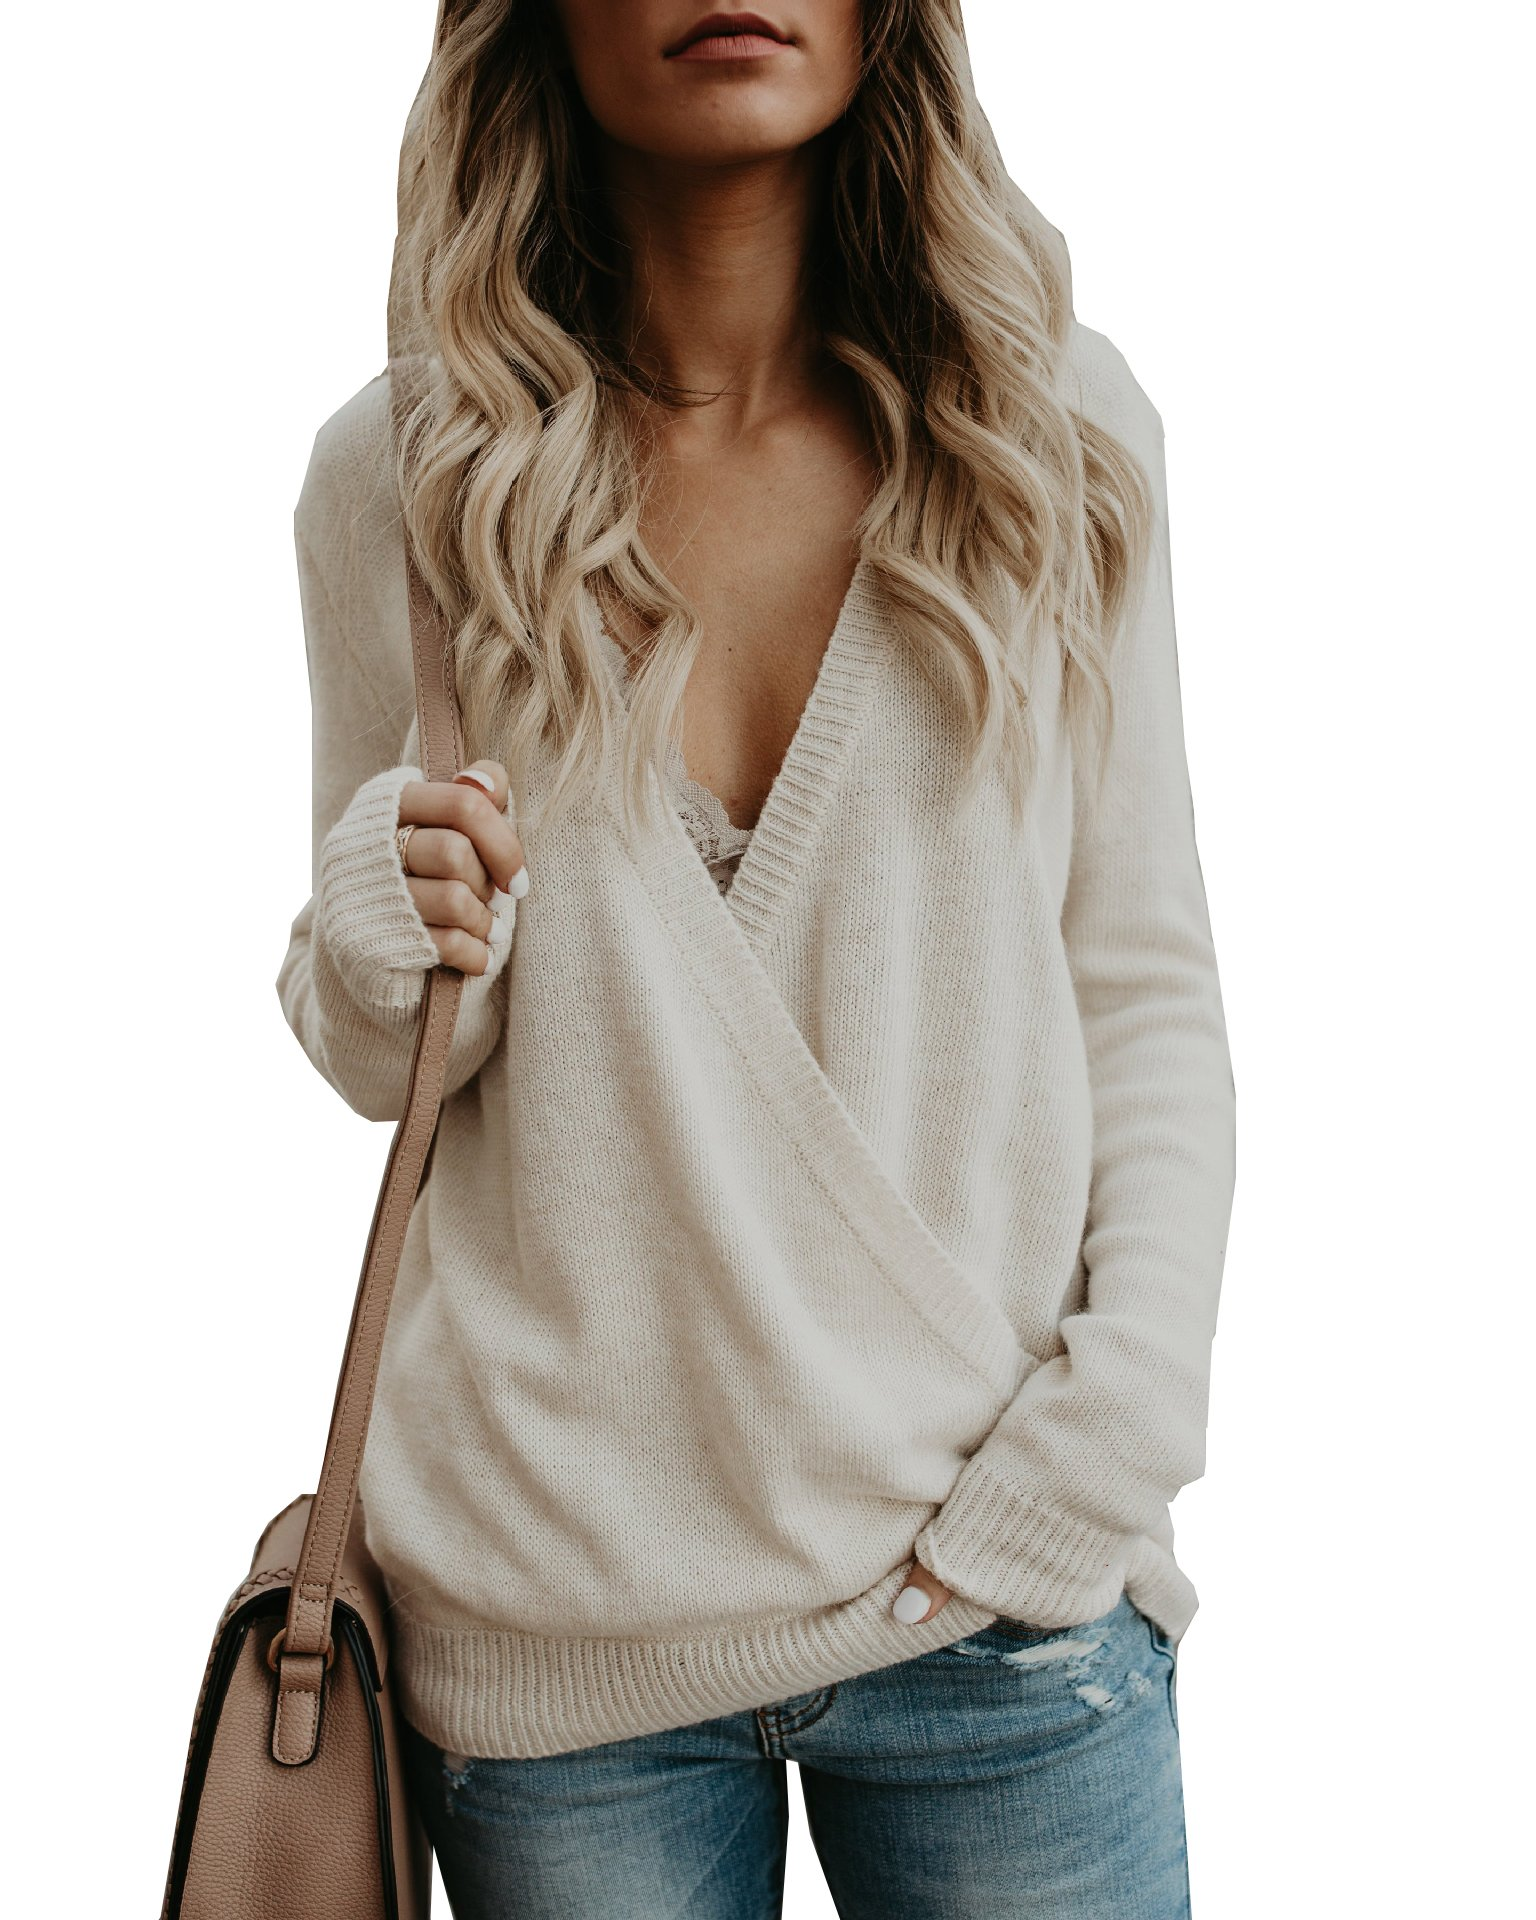 PRETTYGARDEN Women's Knitted Deep V-Neck Long Sleeve Wrap Front Loose Sweater Pullover Jumper (Beige, Medium)